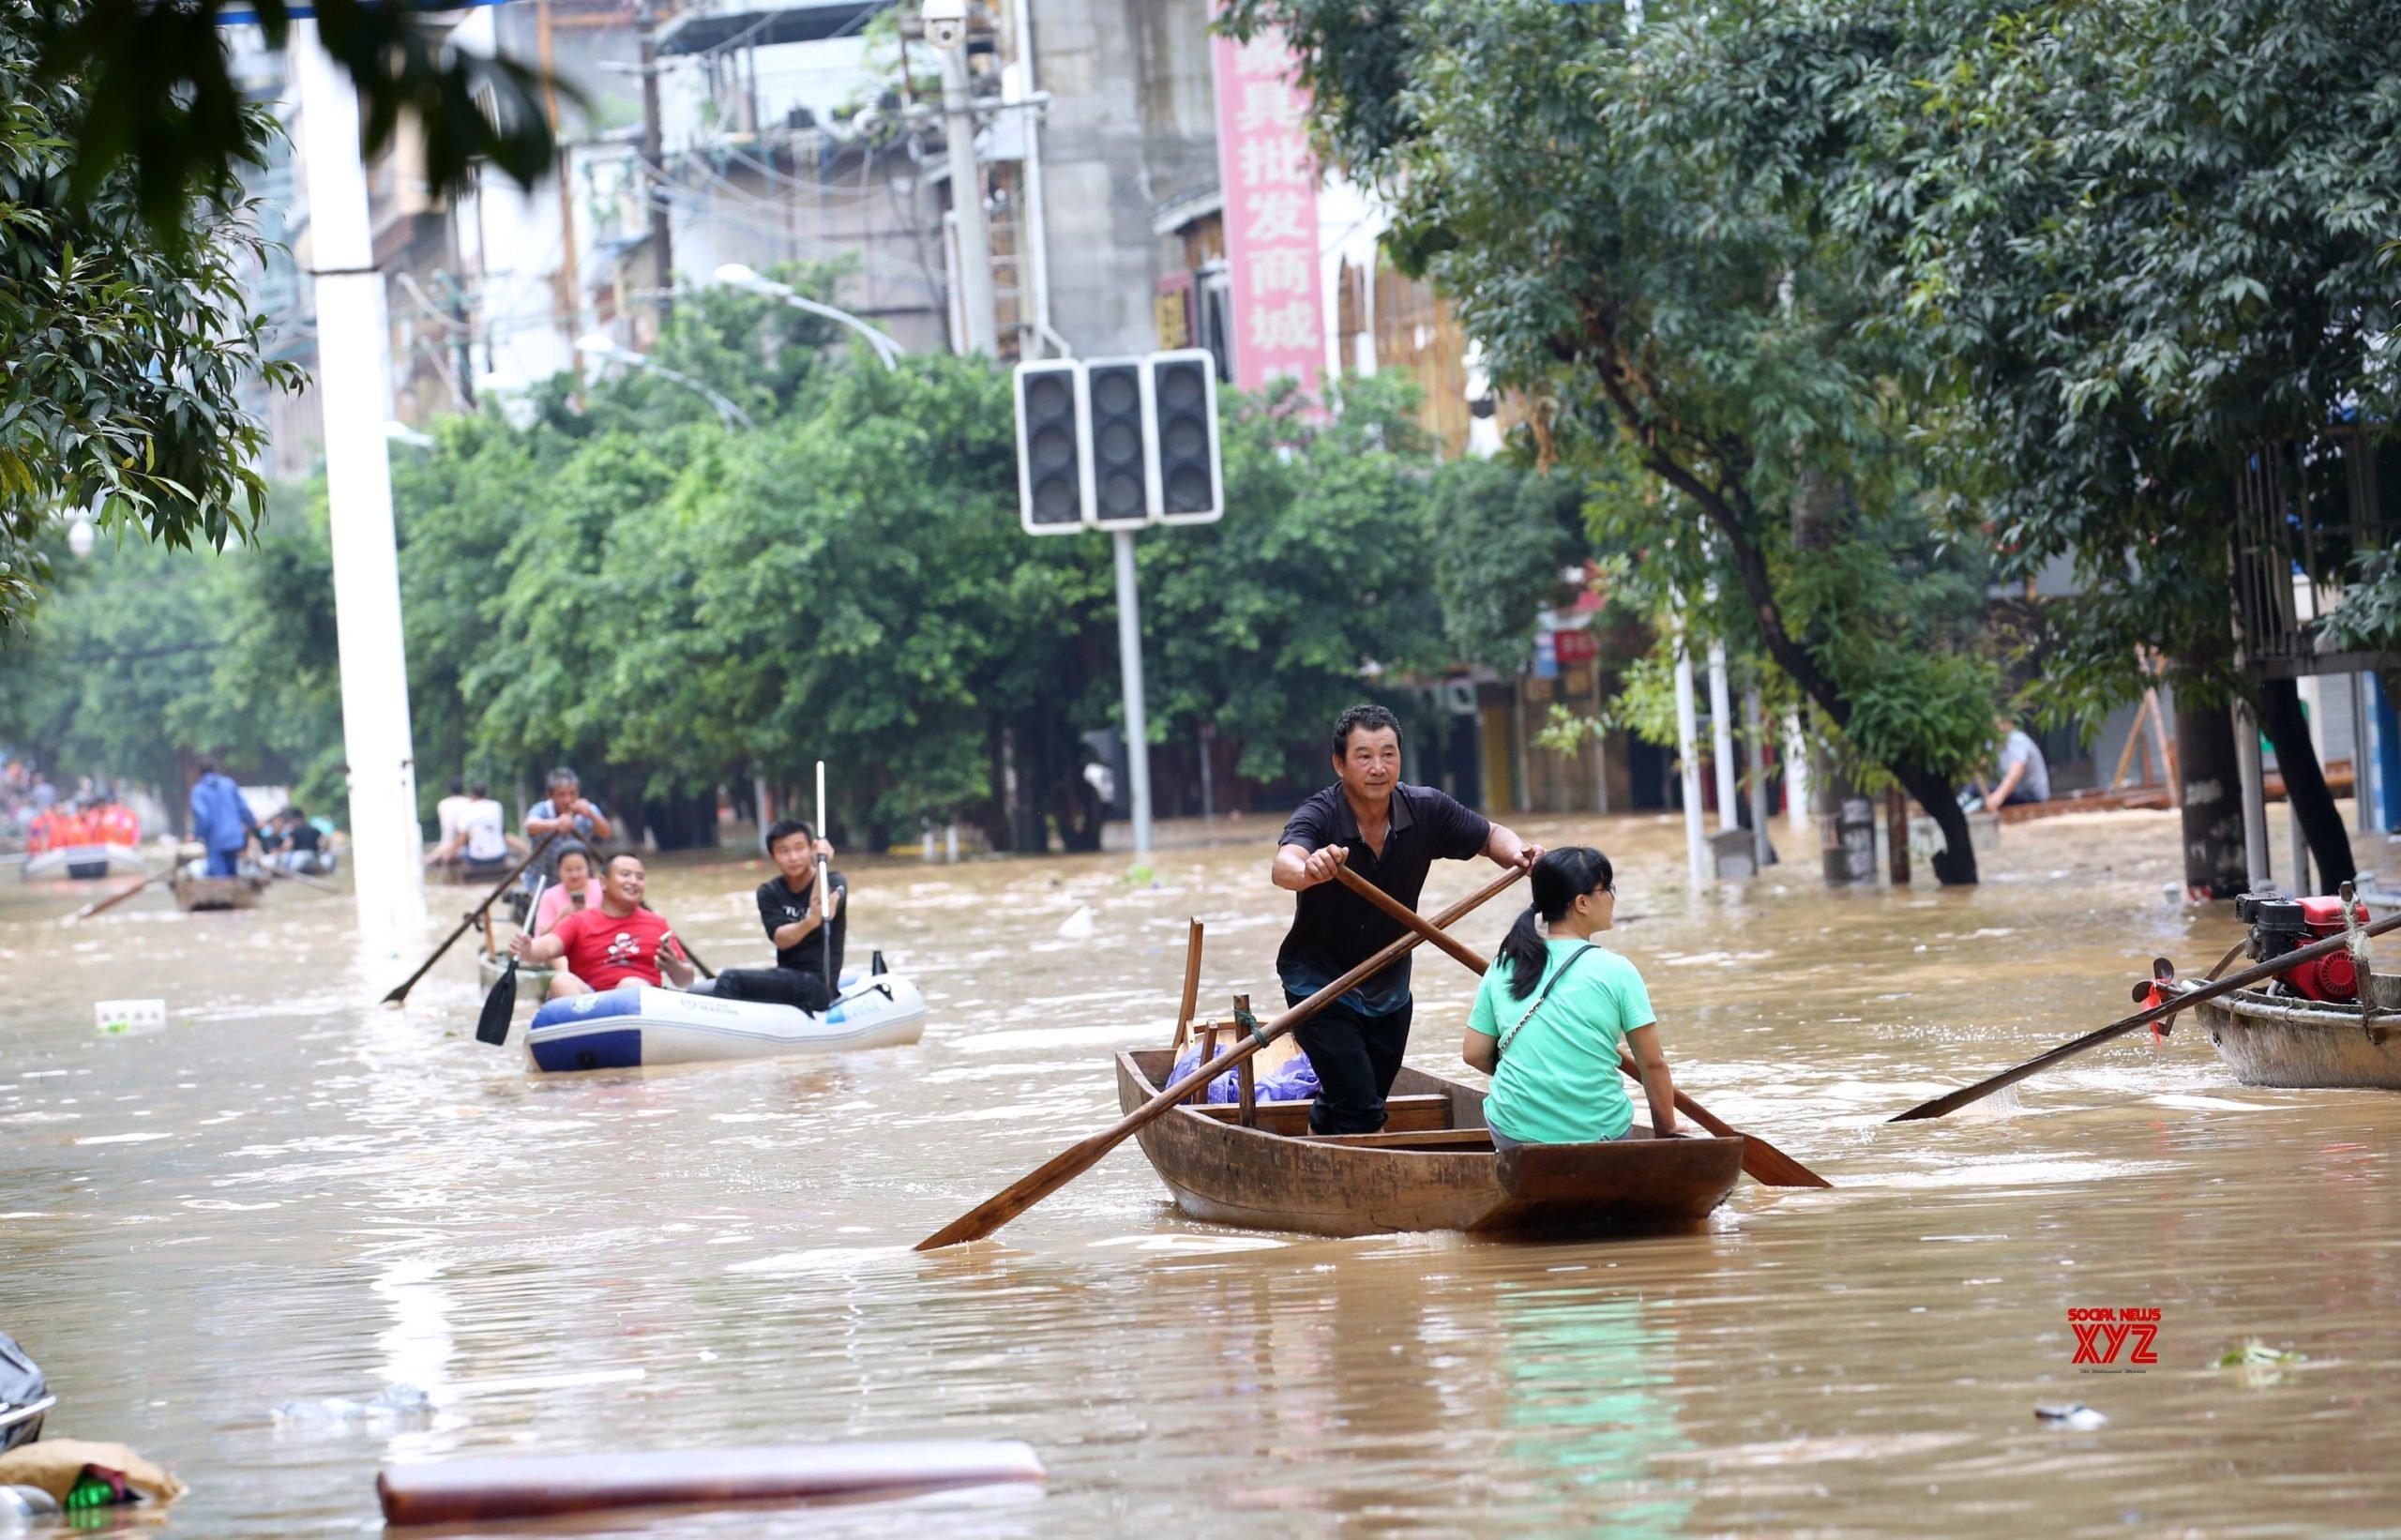 12 killed, thousands evacuated as floods ravage China